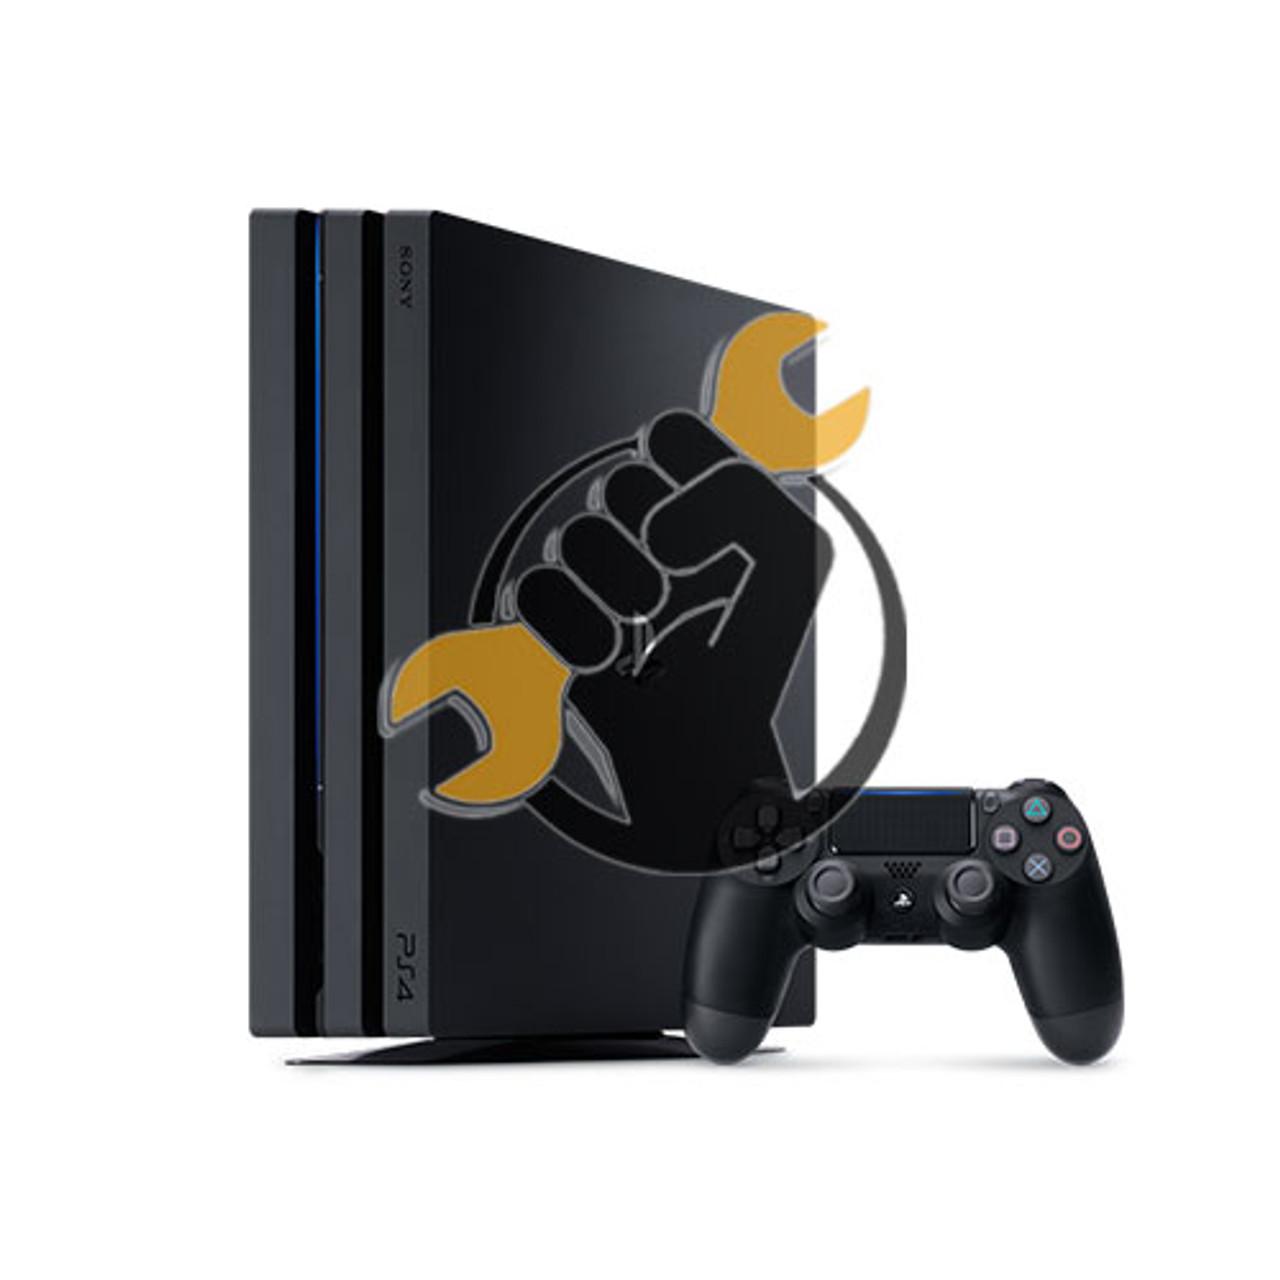 PlayStation 4 (PS4) PRO Repair Service